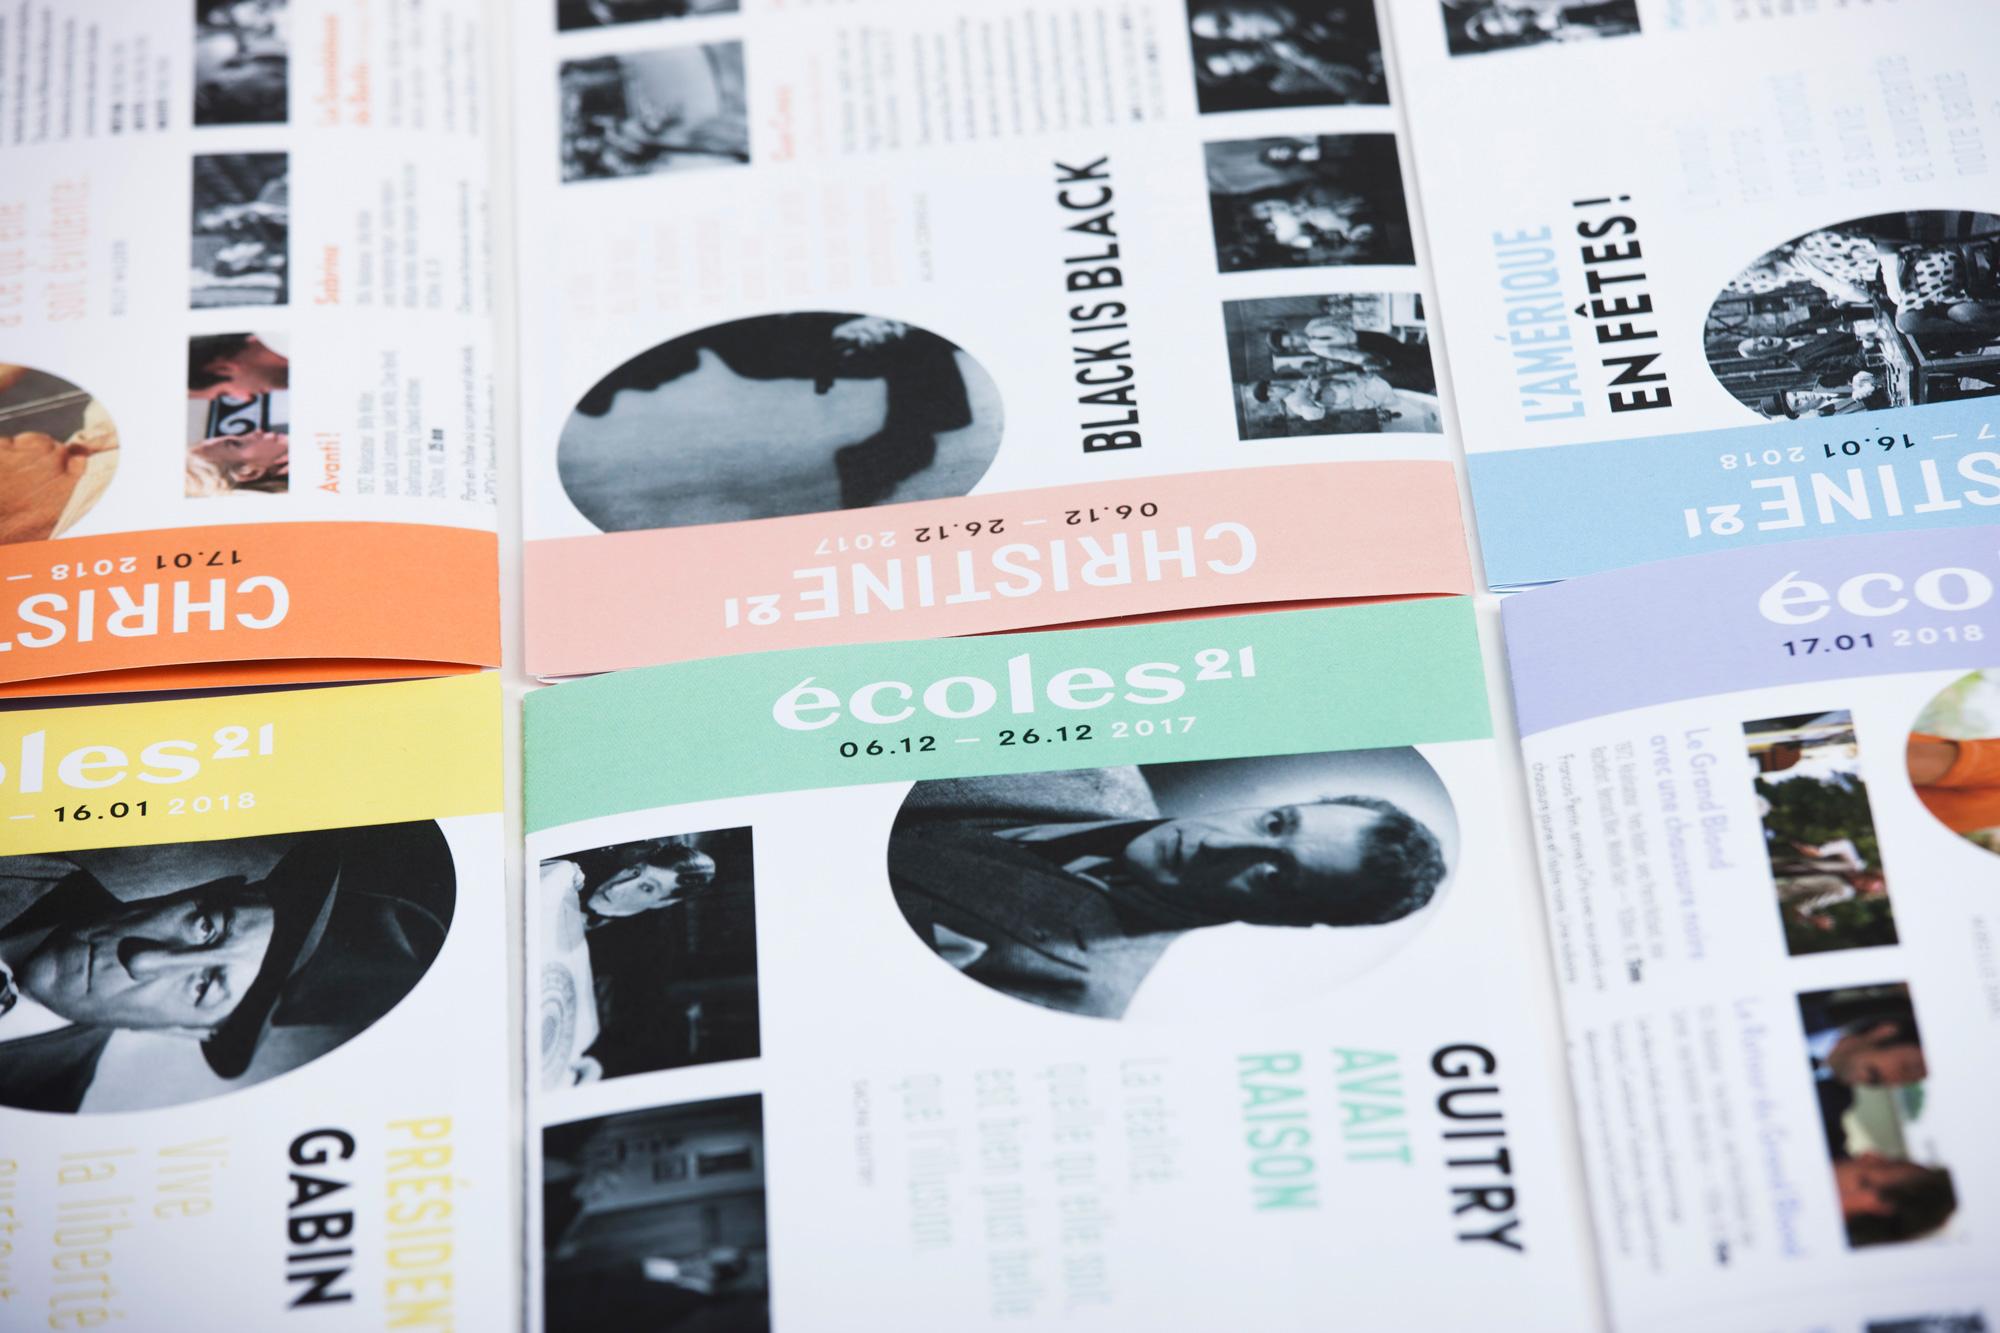 narrative edition programme cinemas 21